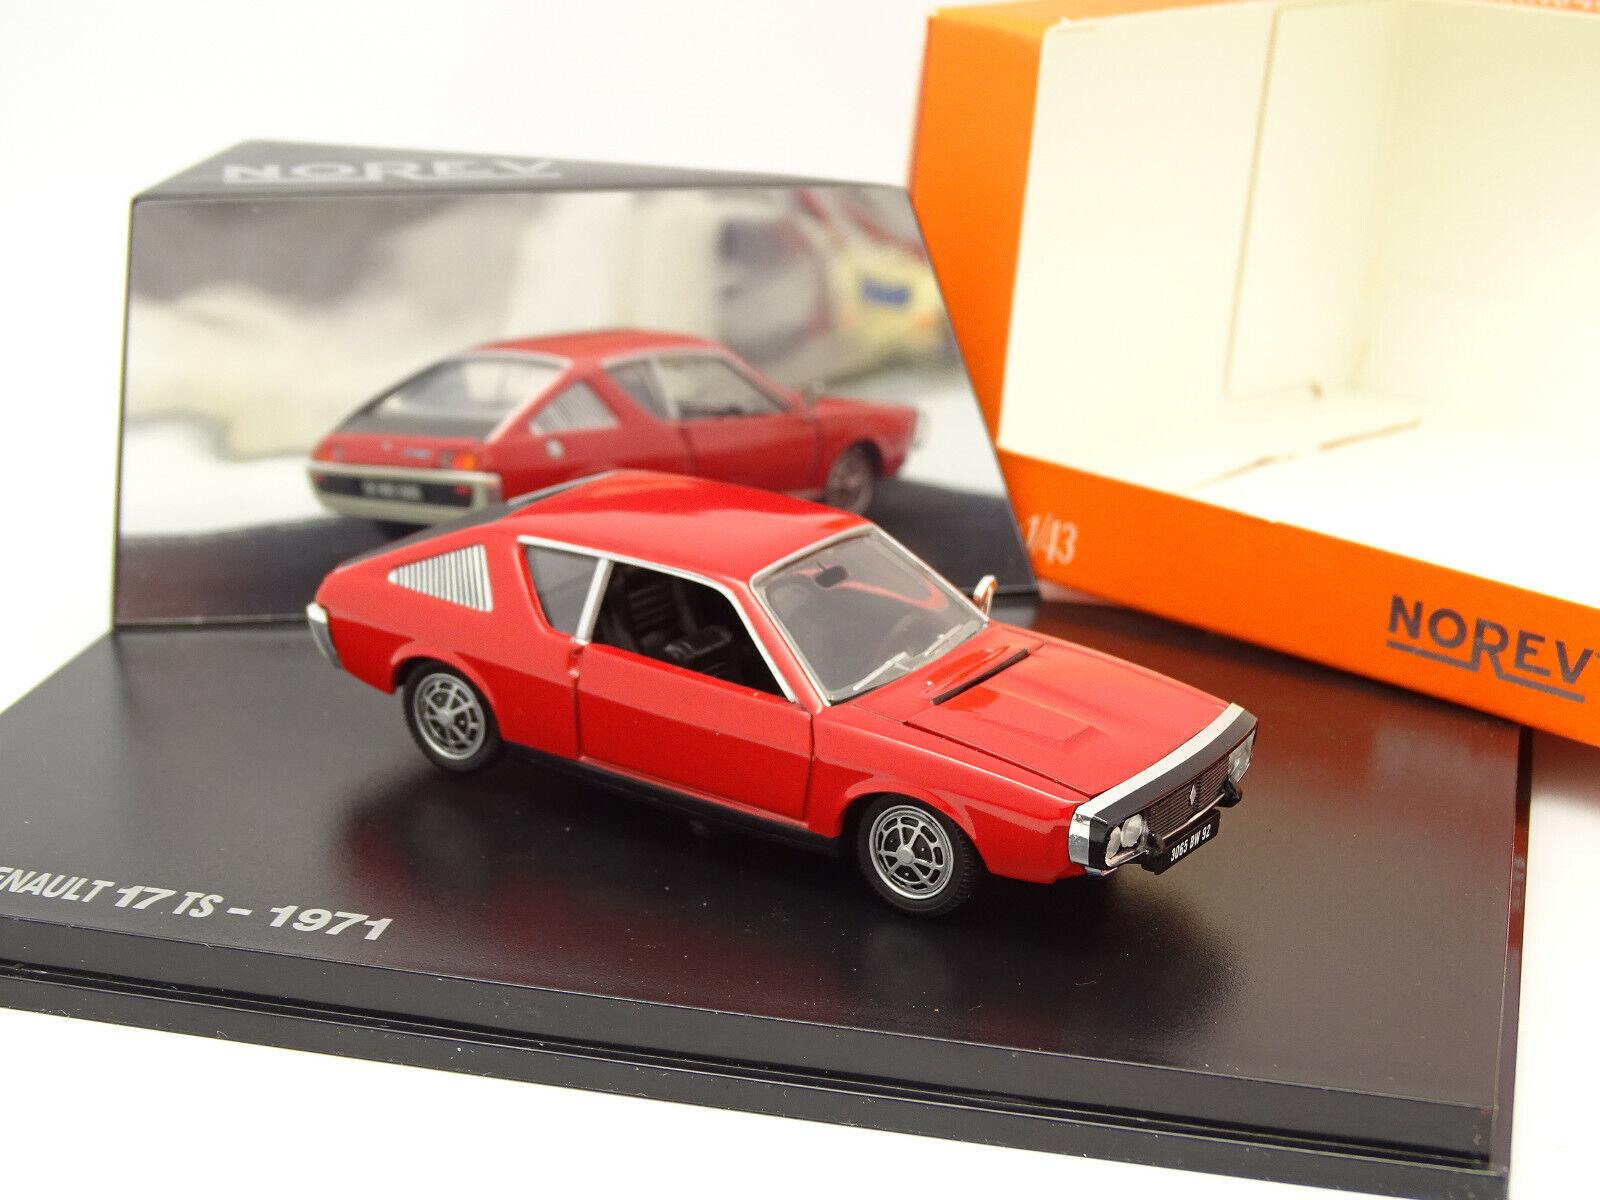 Norev 1 43 - Renault 17 Ts 1971 Rojo